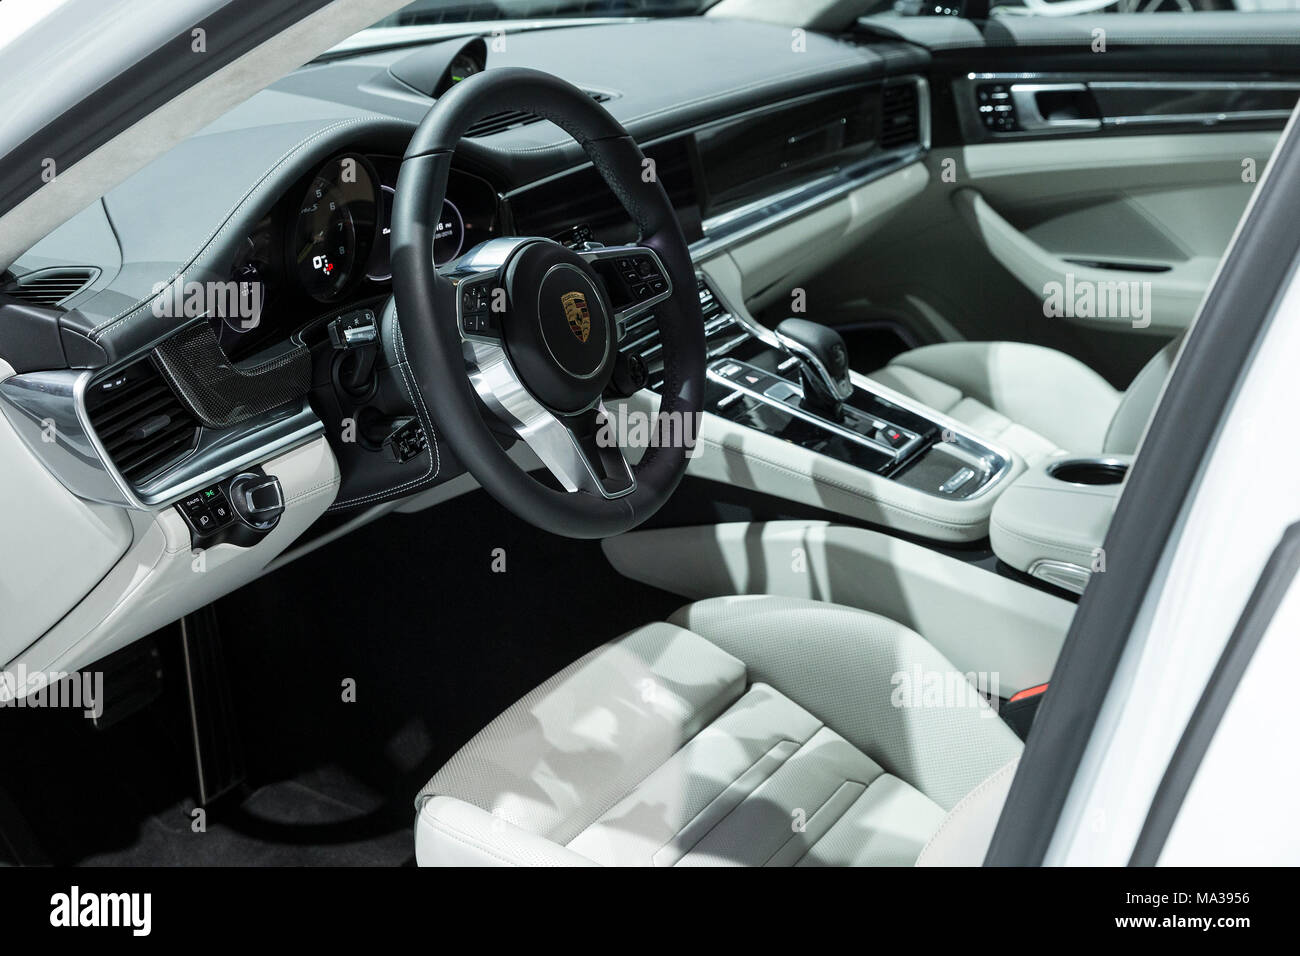 Panamera Turbo S E Hybrid Stock Photos & Panamera Turbo S E Hybrid Stock Images - Alamy